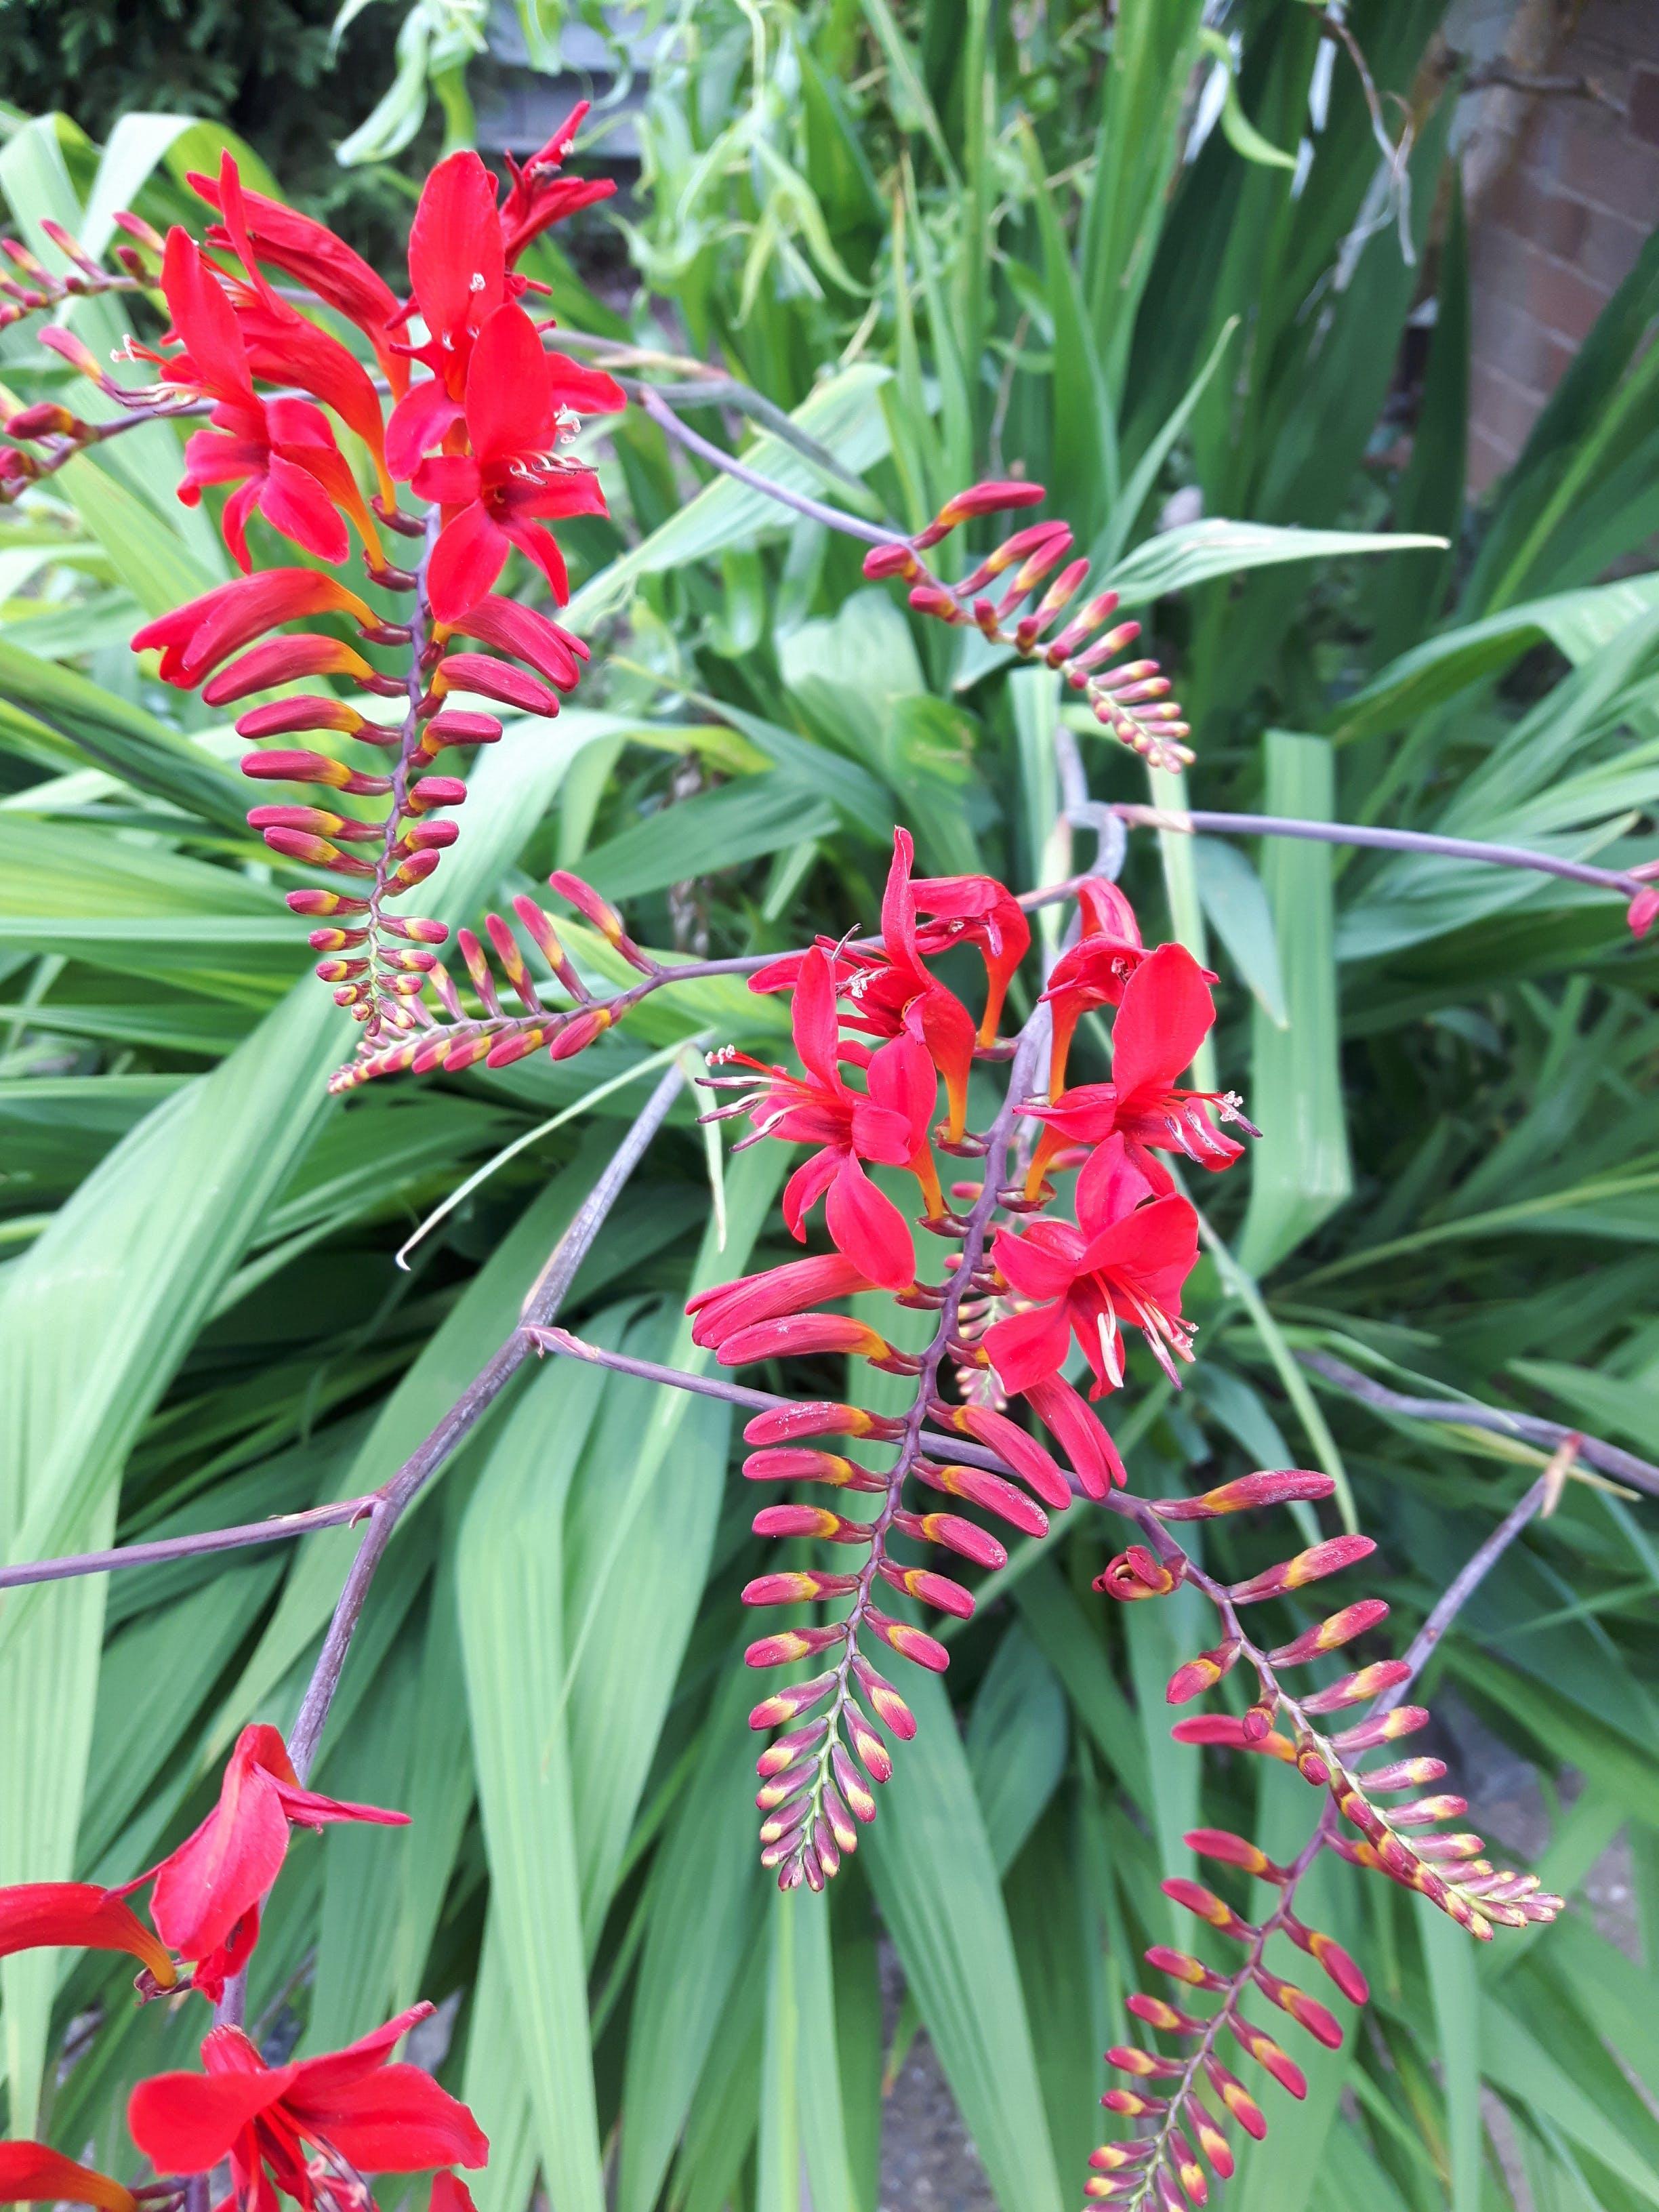 Free stock photo of Crocosmia, red crocosmia, red flowers, red plants